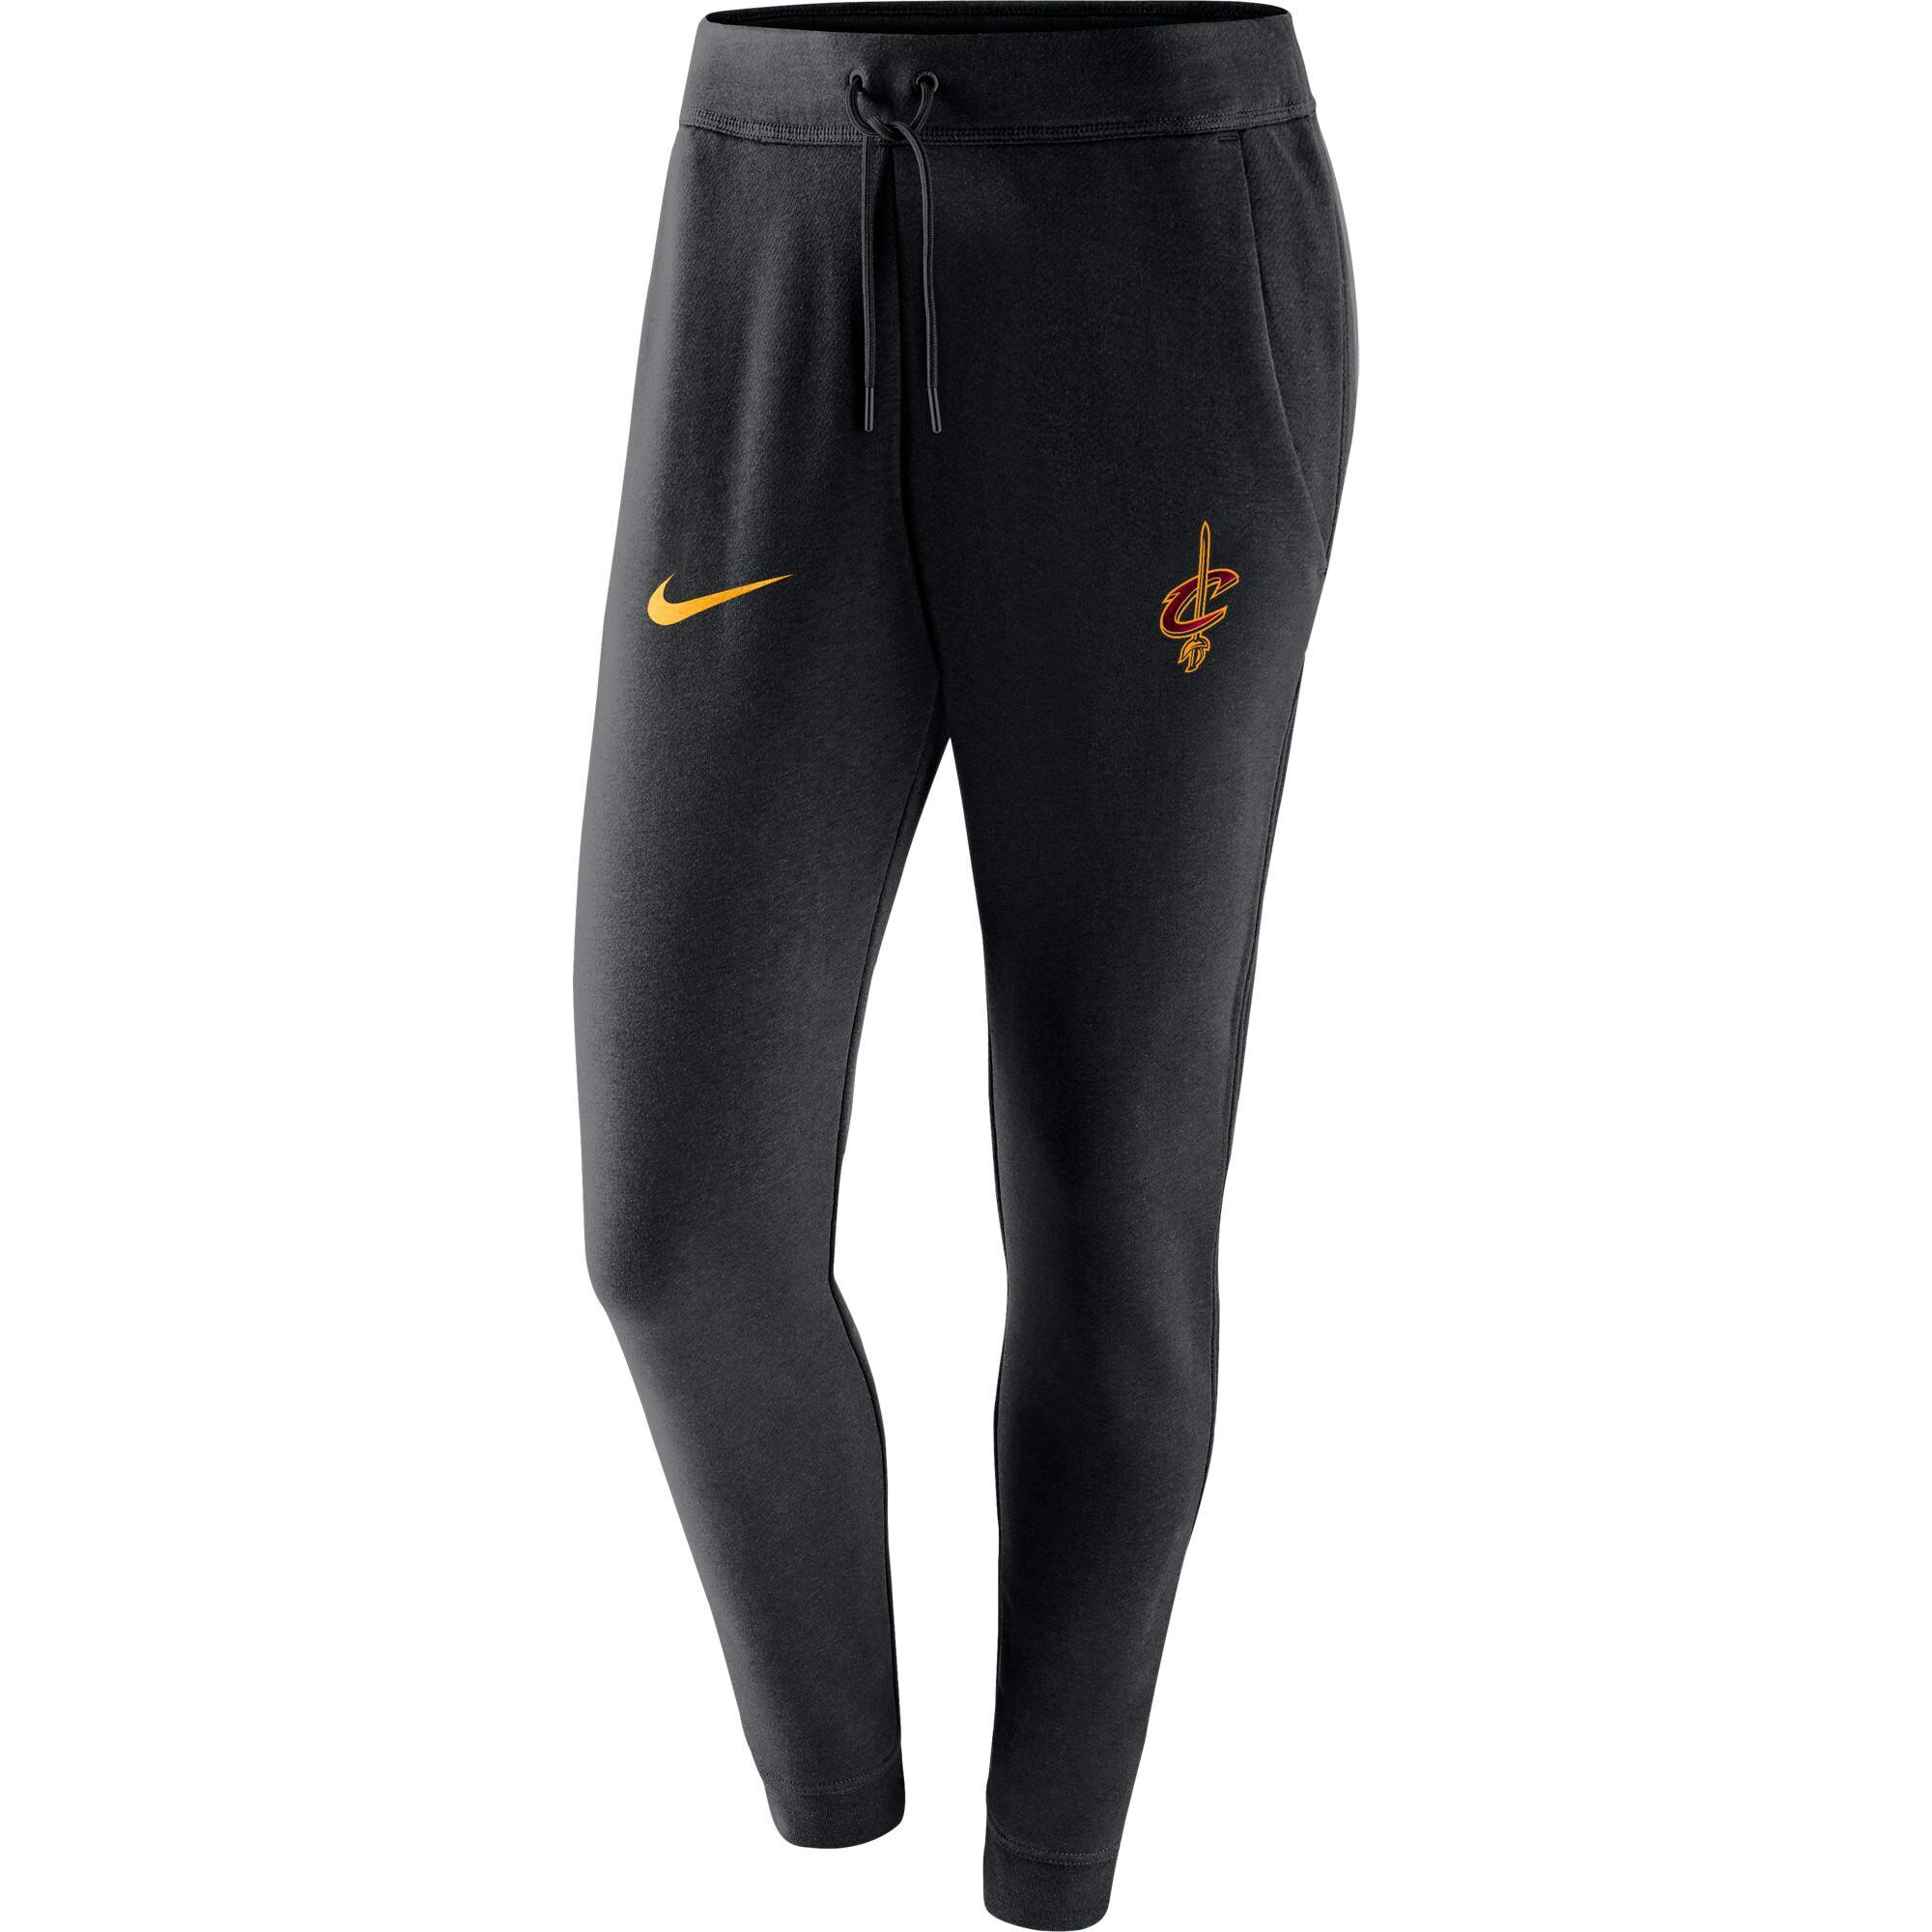 Cleveland Cavaliers Nike Women's Modern Pant - Black